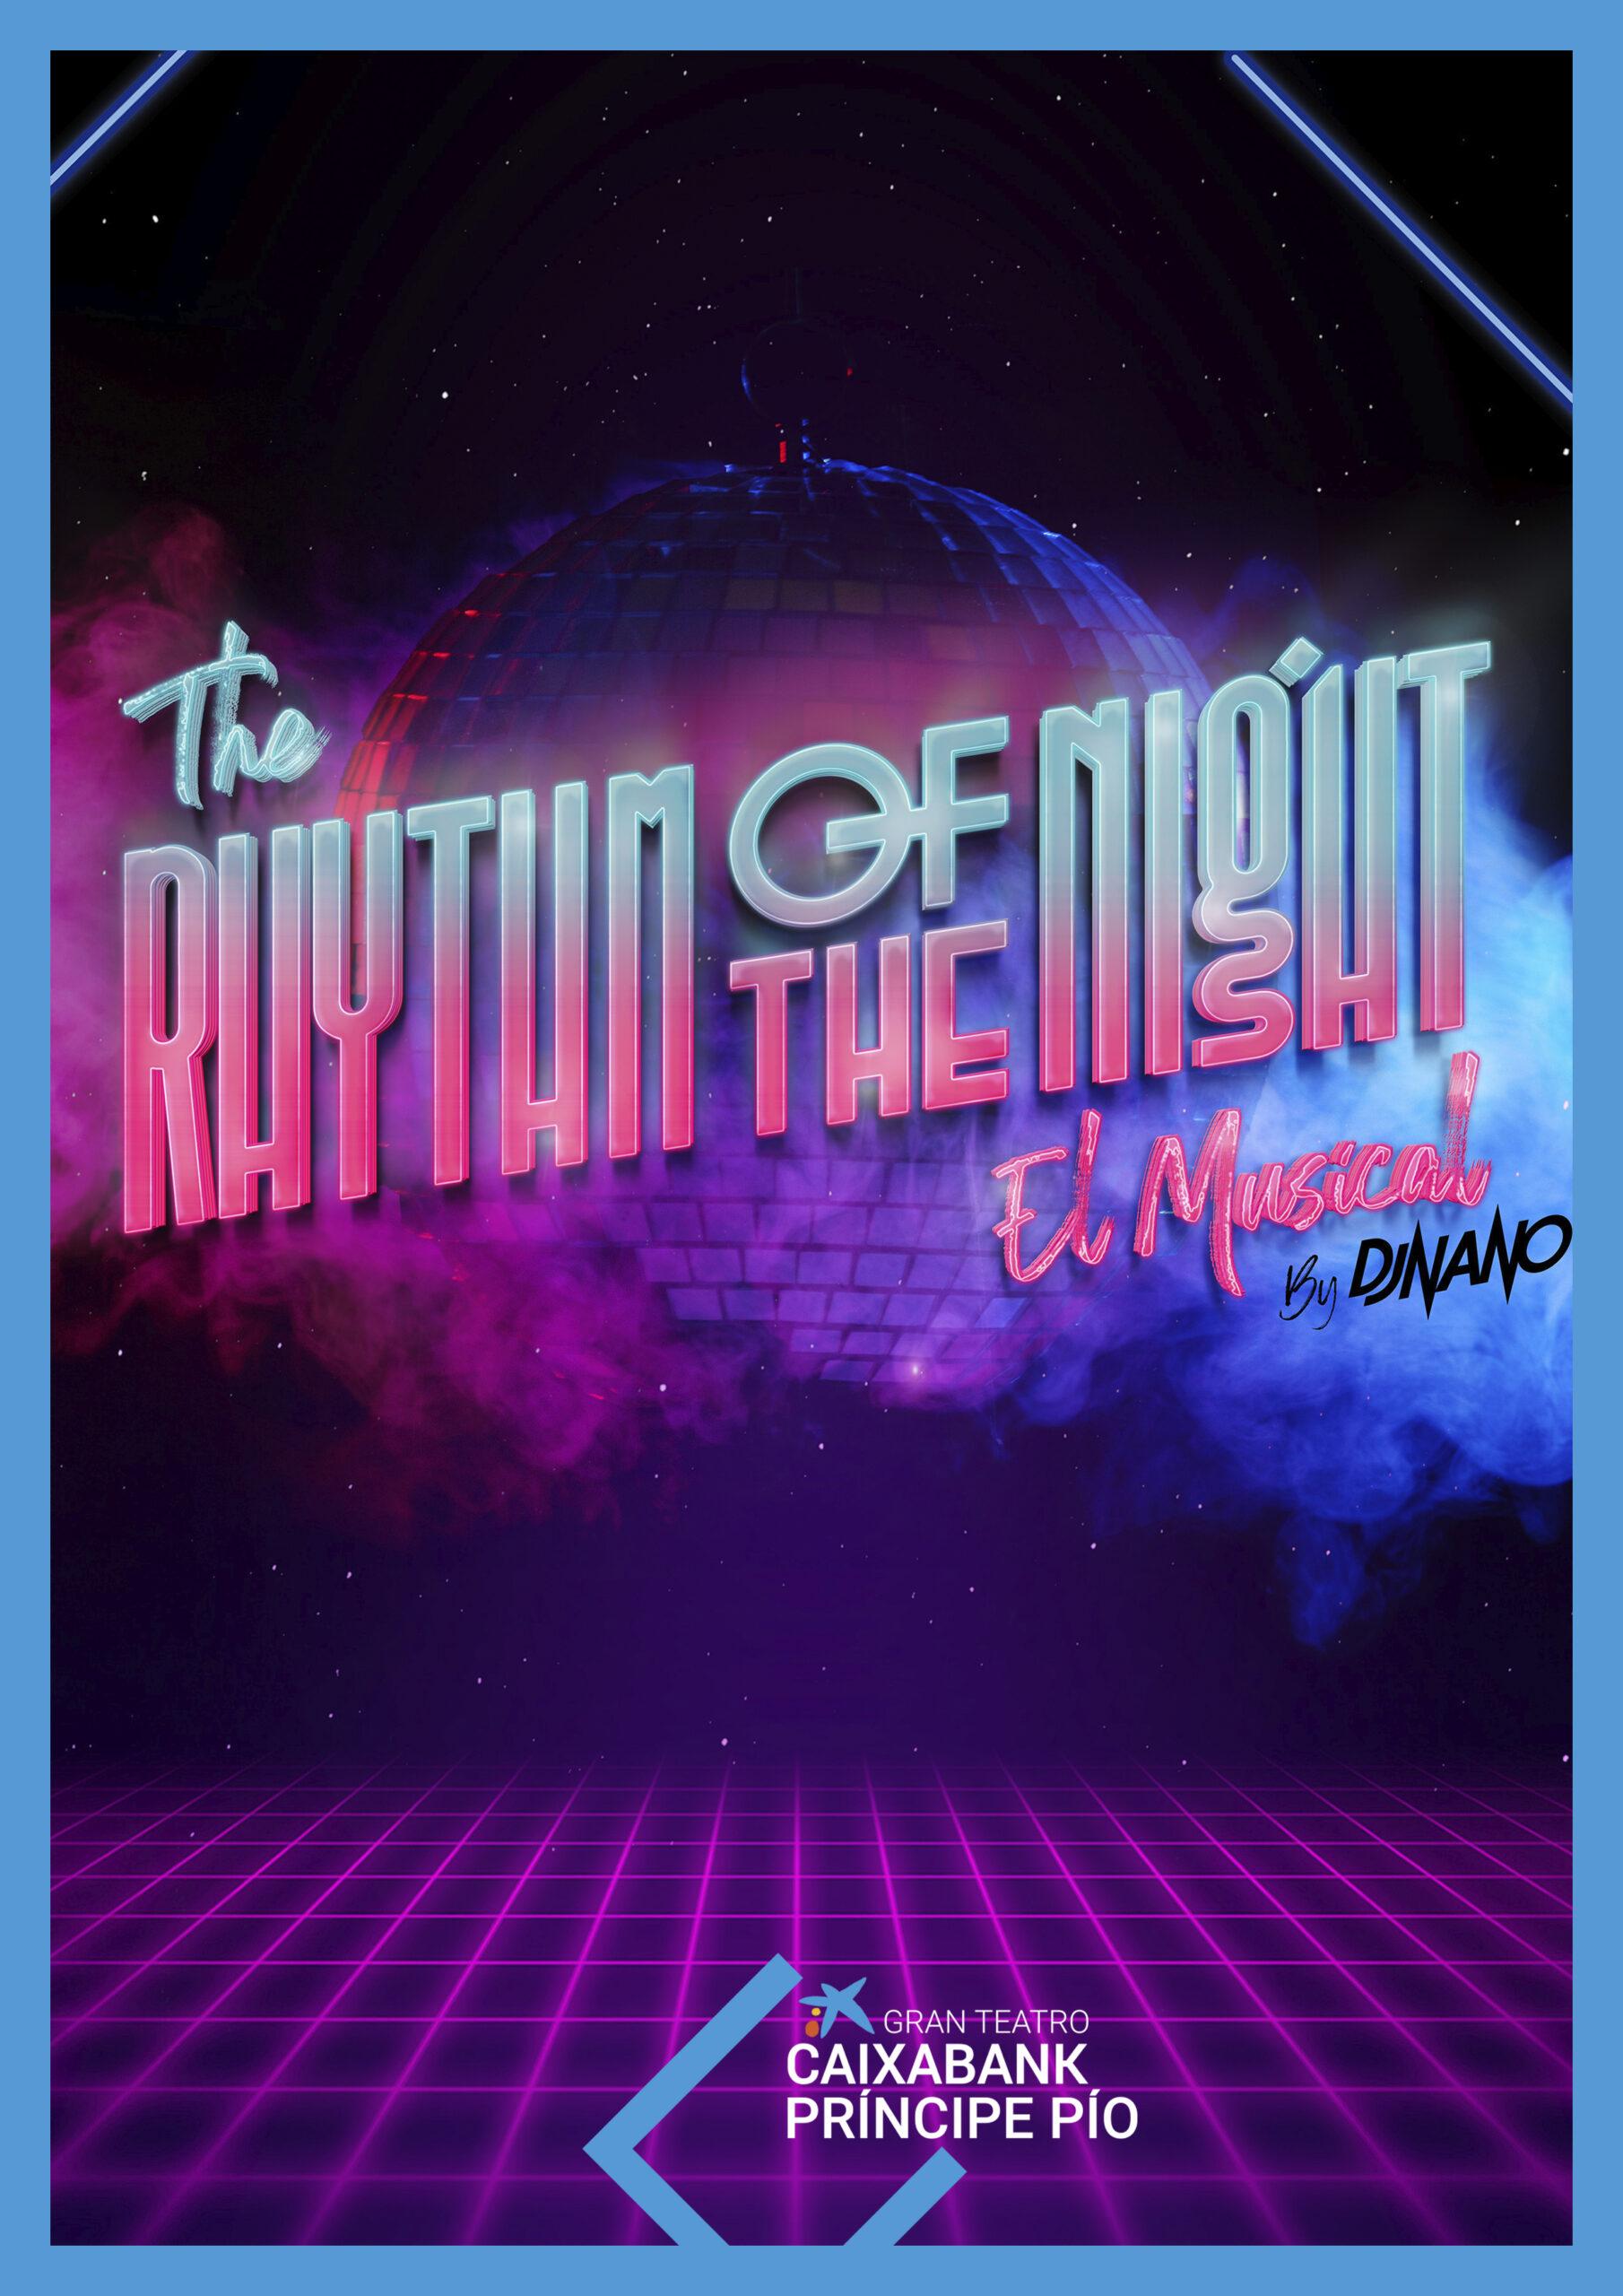 THE RHYTHM OF THE NIGHT. EL MUSICAL. DJ NANO